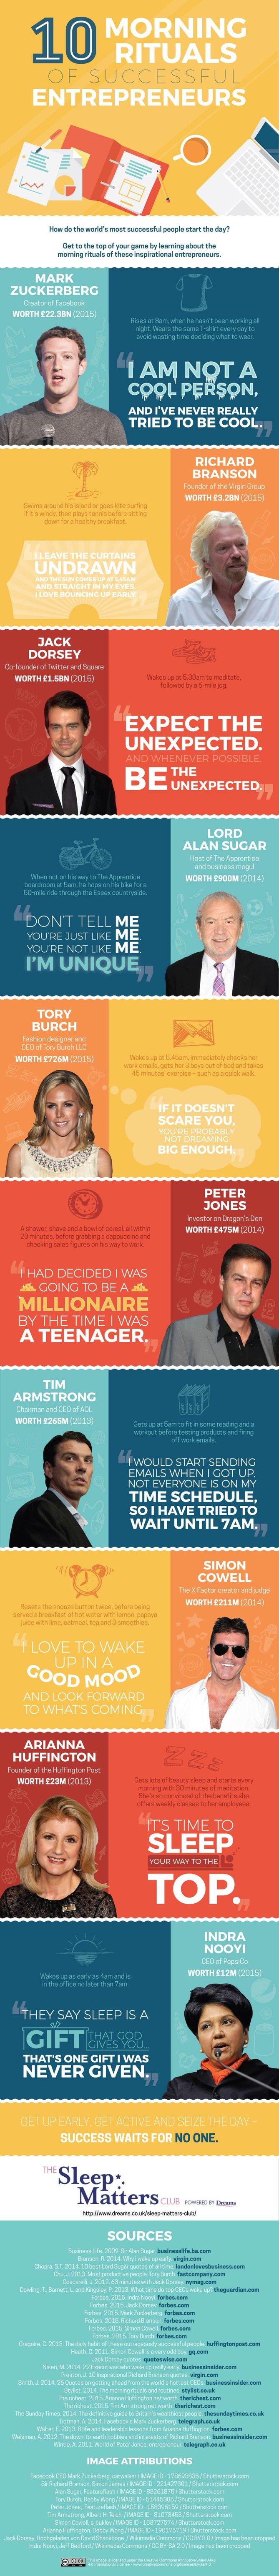 10-morning-rituals-of-successful-entrepreneurs.jpg